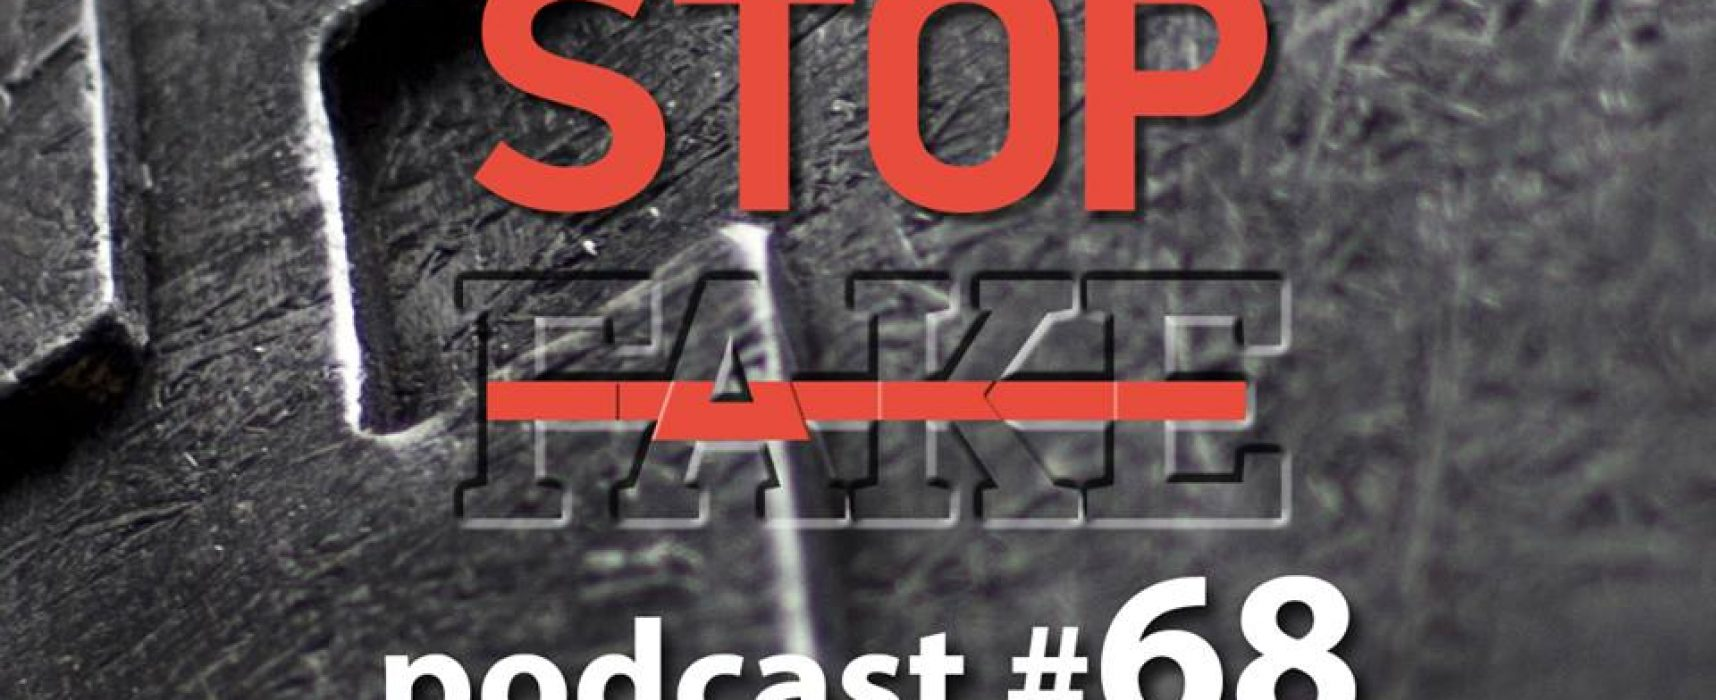 StopFake podcast #68